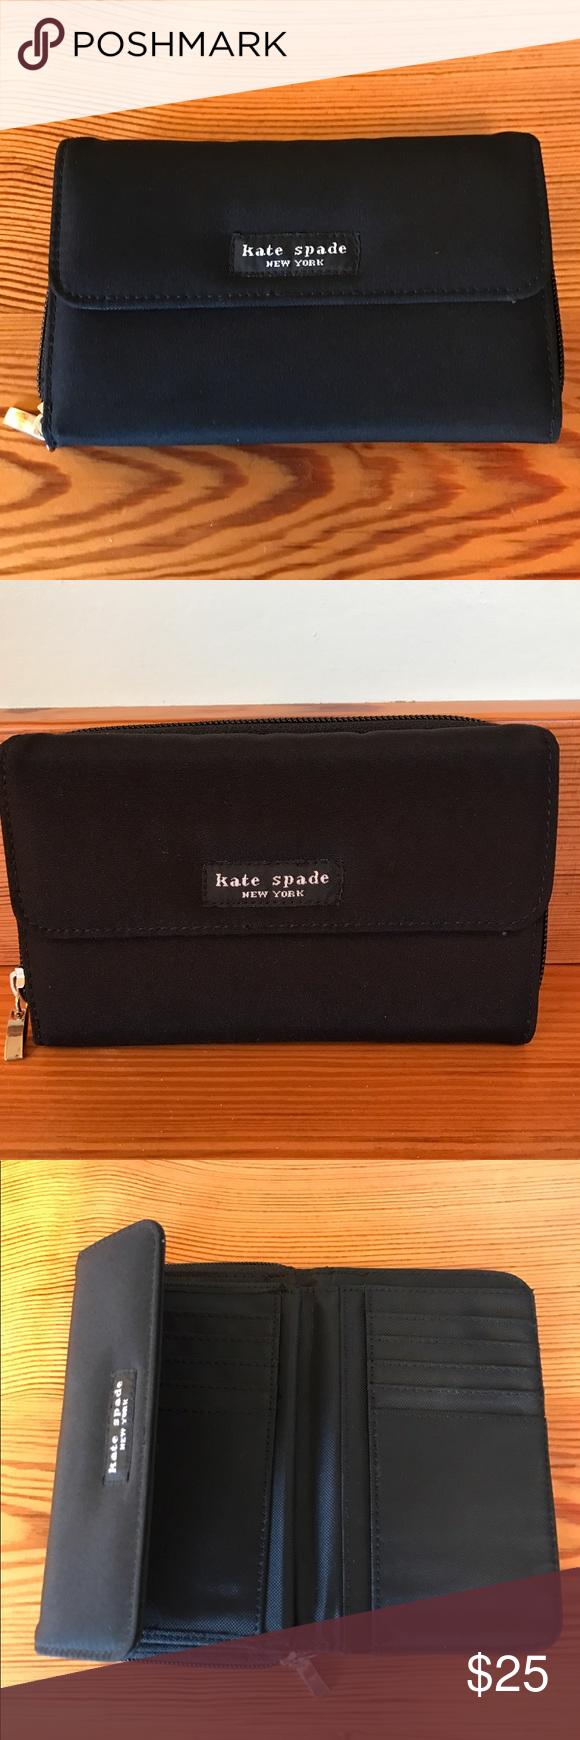 Kate Spade Wallet Black Kate Spade wallet. Great condition. kate spade Bags Wallets